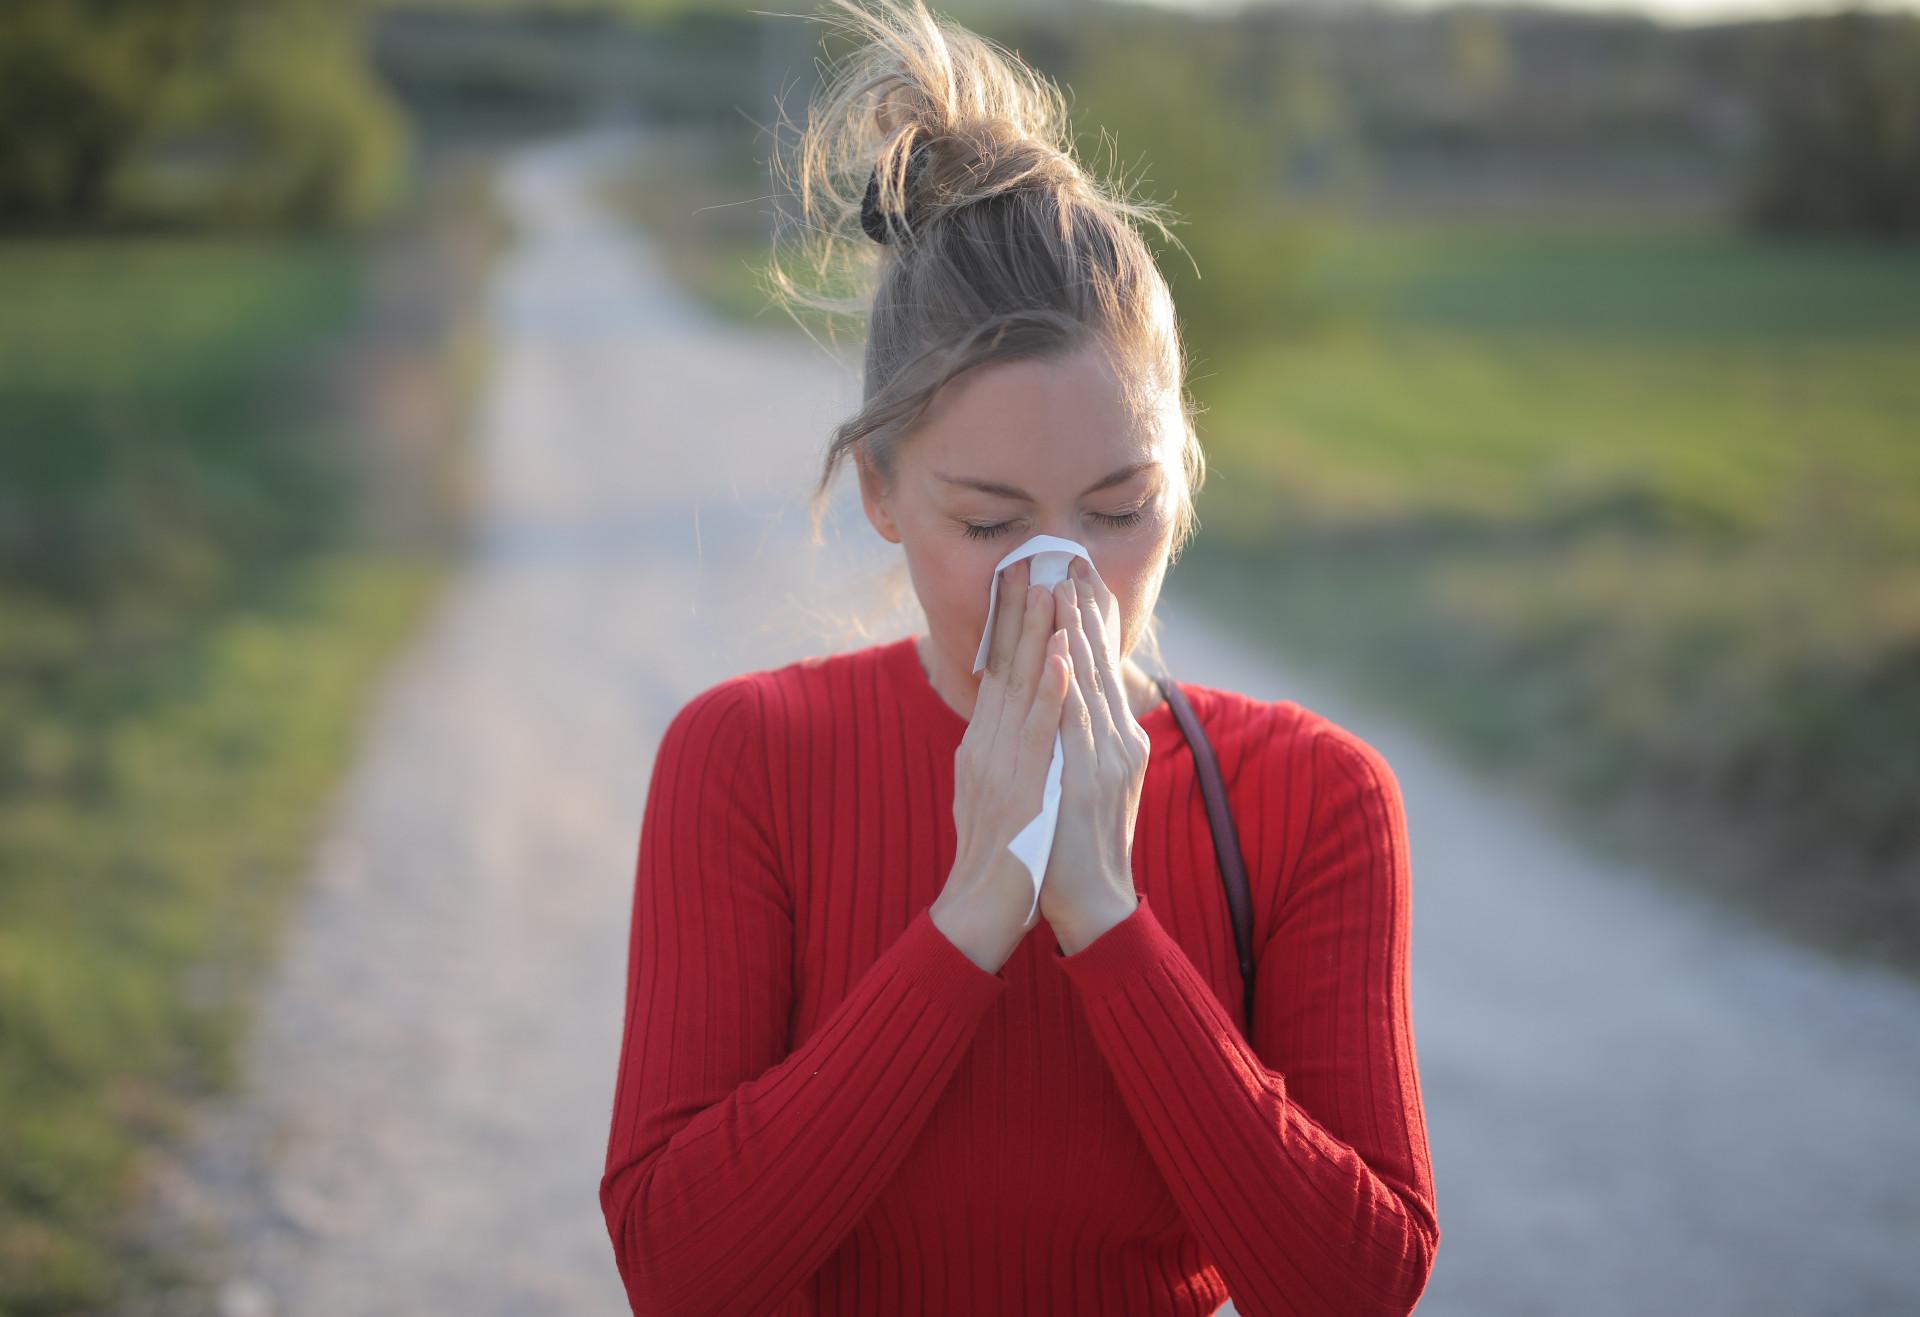 Alergia primaveral: ¿cómo combatirla?